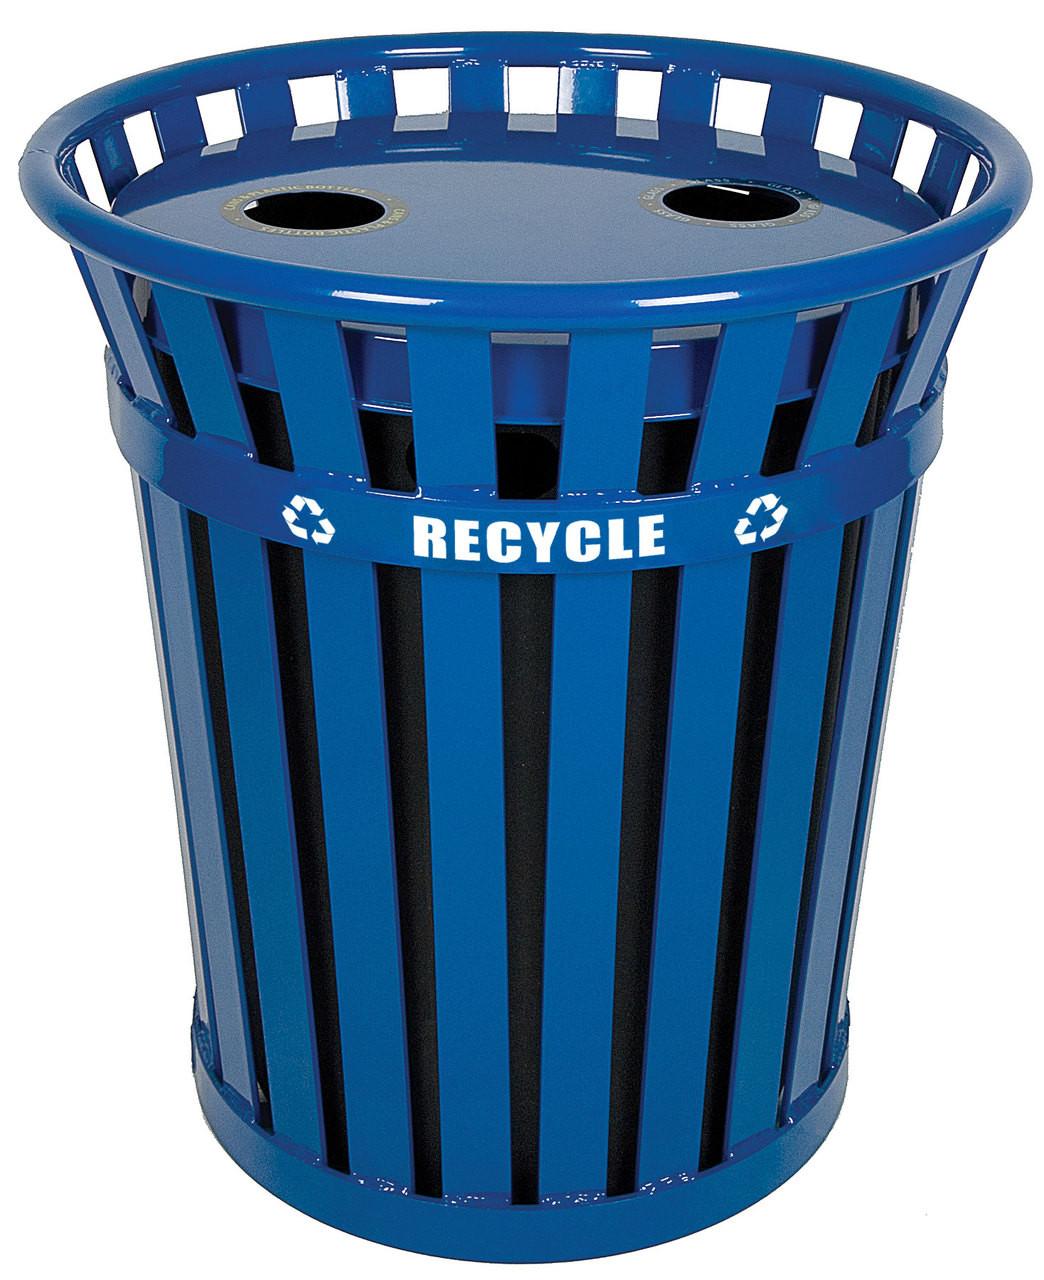 36 Gallon Wydman Metal Recycling Outdoor Park Trash Can WCR36-FTR-BL